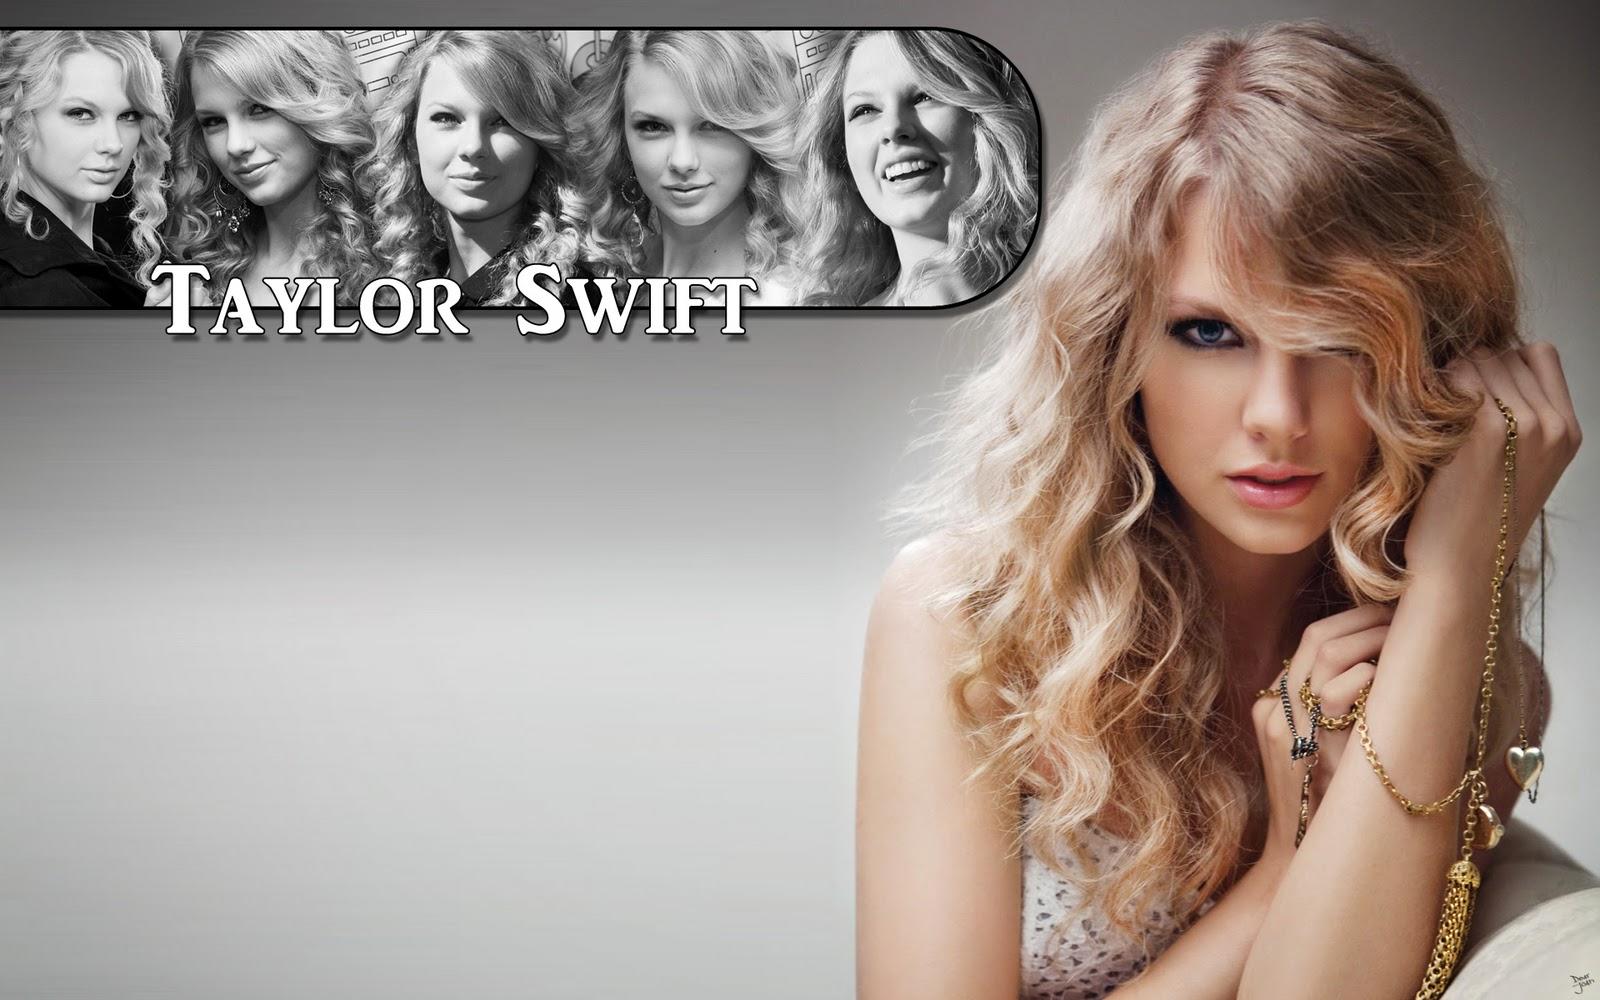 http://4.bp.blogspot.com/-yzQ4Z_M8lrI/TxQjLC2vbpI/AAAAAAAABCw/r49H8ngcgq4/s1600/Taylor-Swift-Hot-Wallpapers-1.jpg